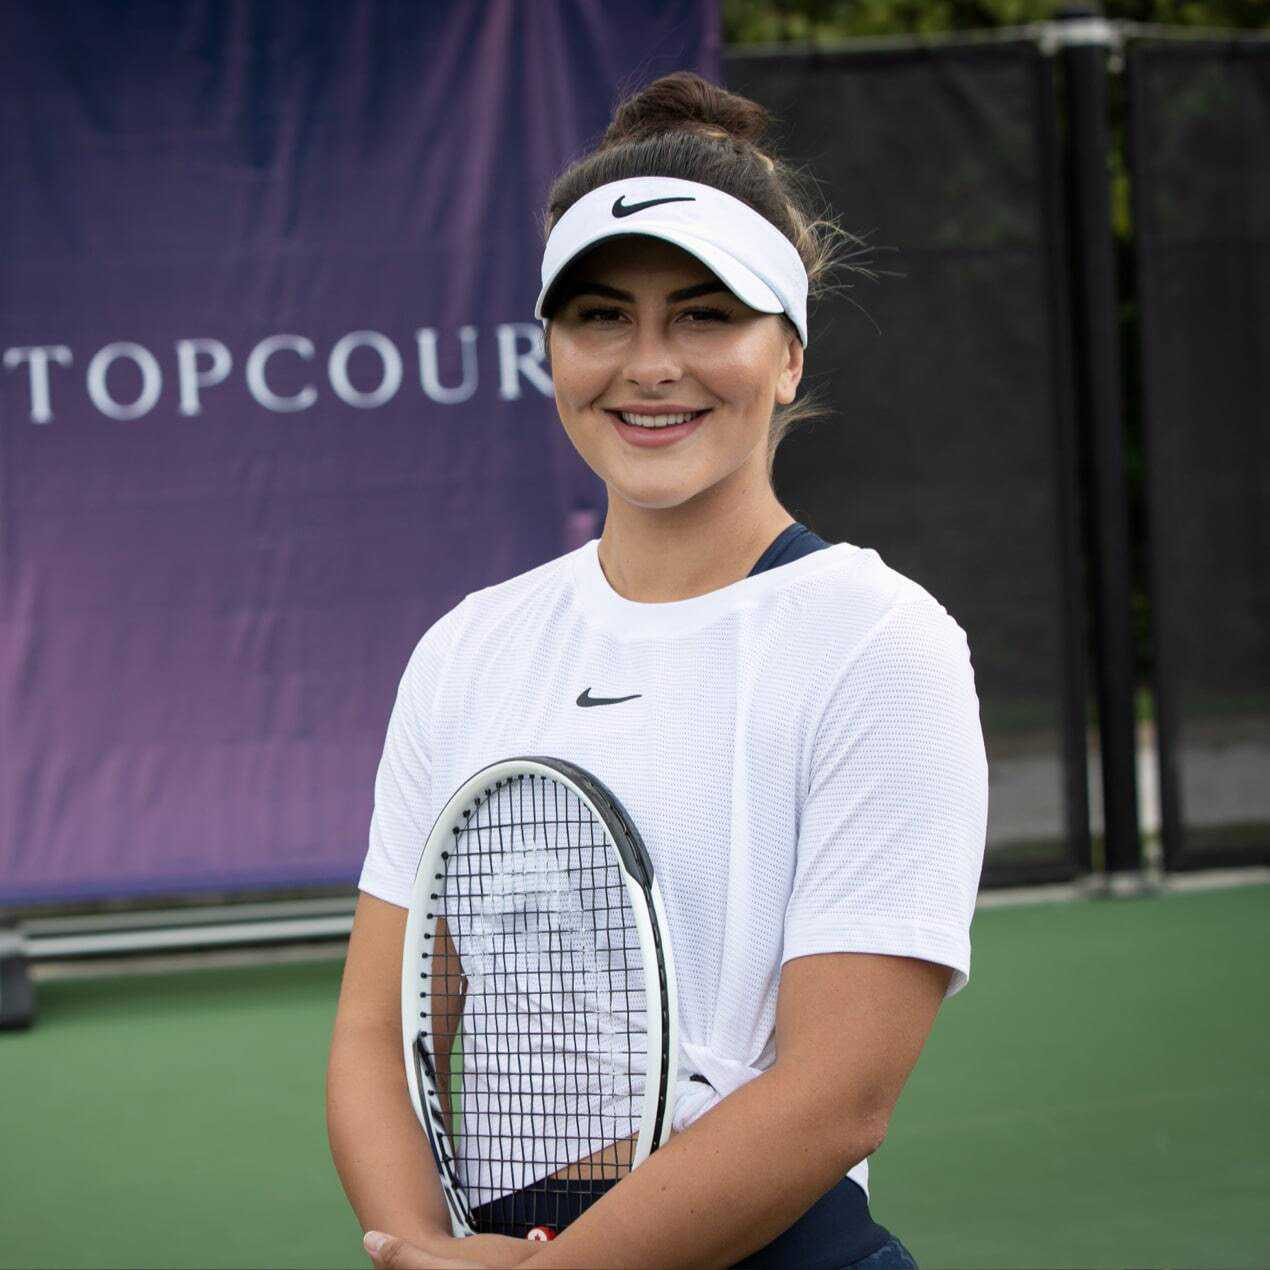 Meet your new TopCourt coach, Bianca Andreescu